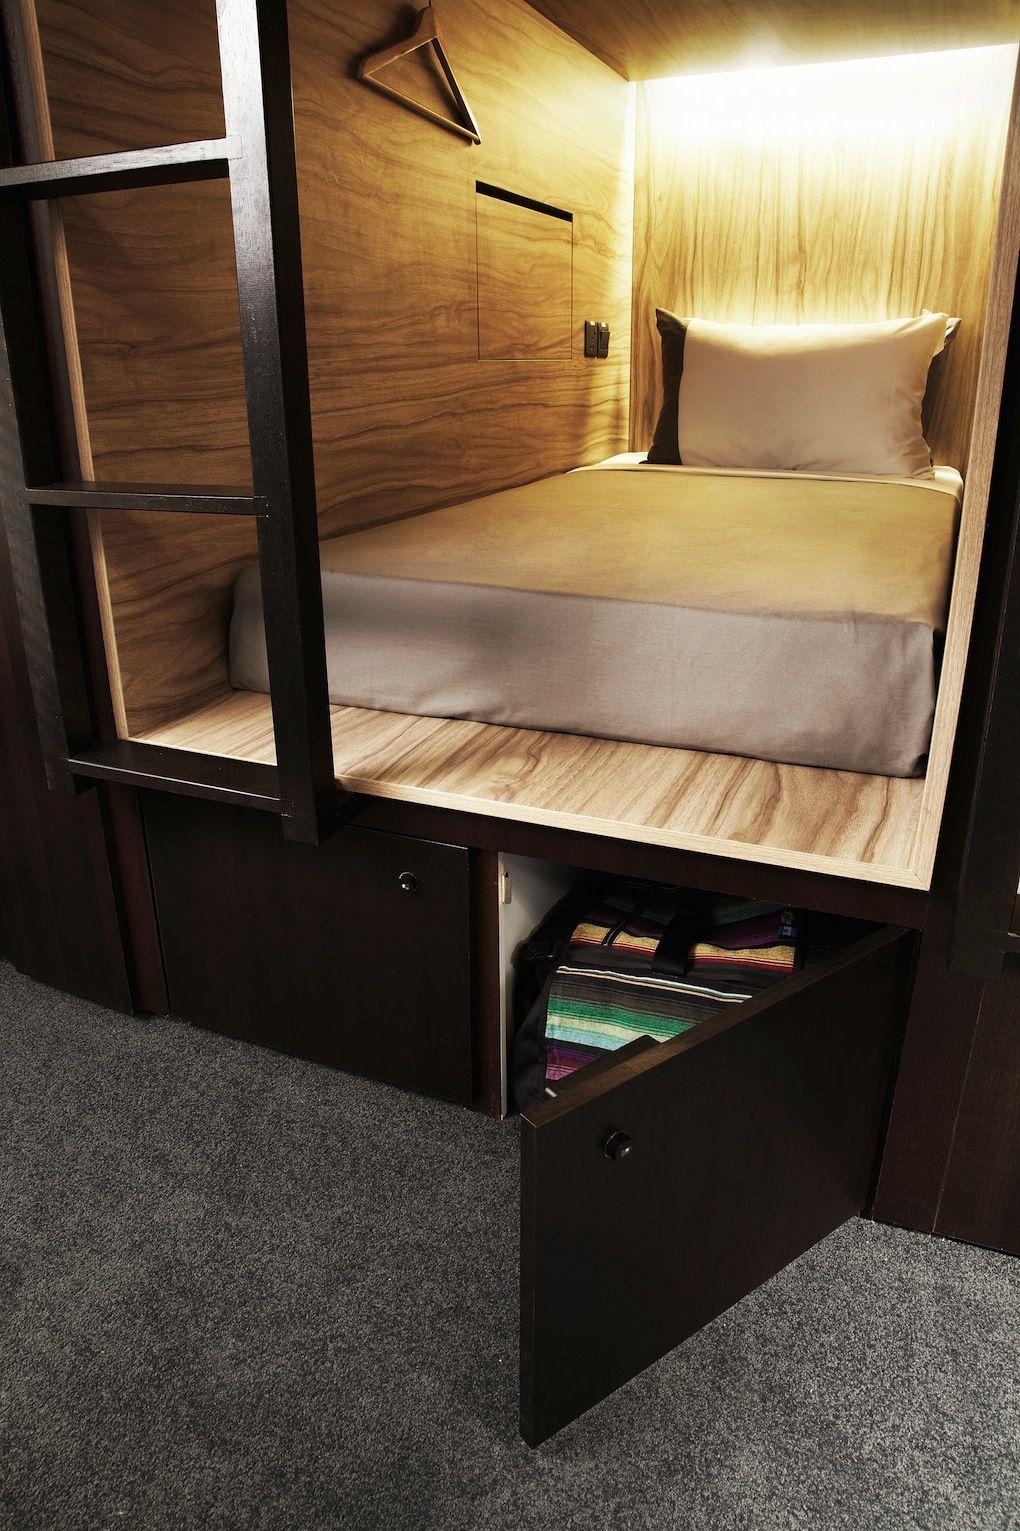 Boutique Hotel Bedrooms: The Pod Boutique Capsule Hotel